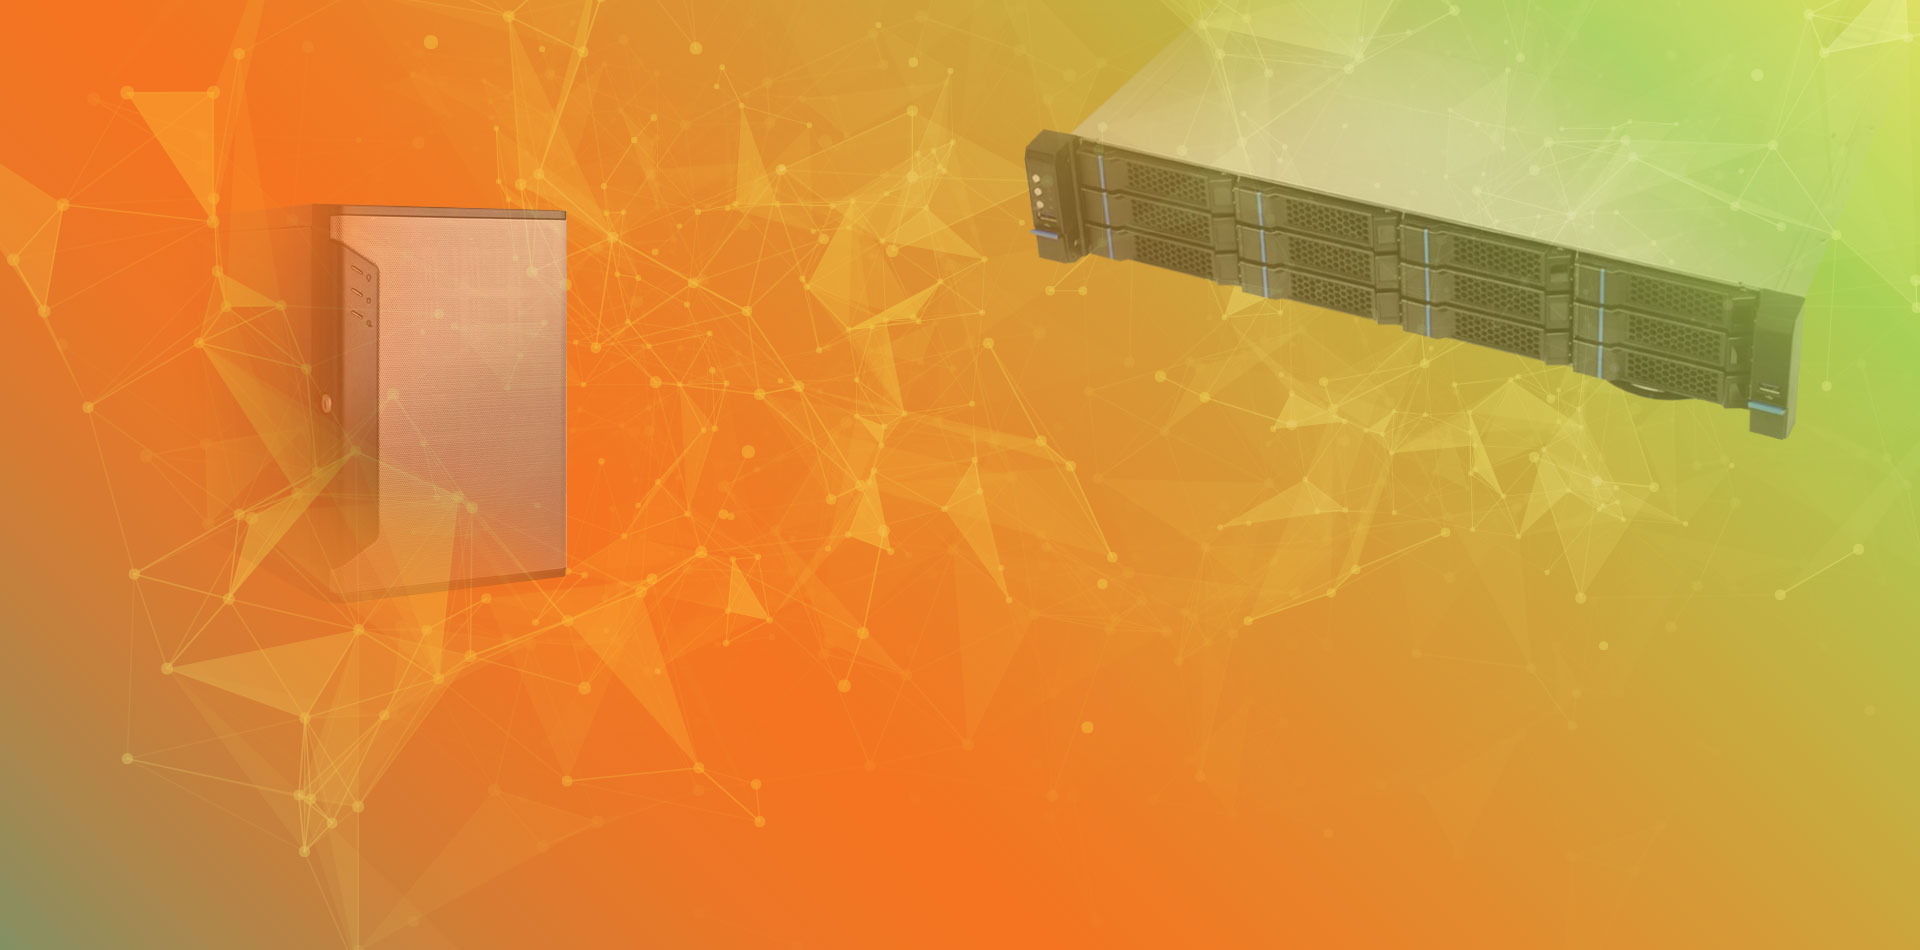 Wisenet WAVE soluções de servidor otimizadas